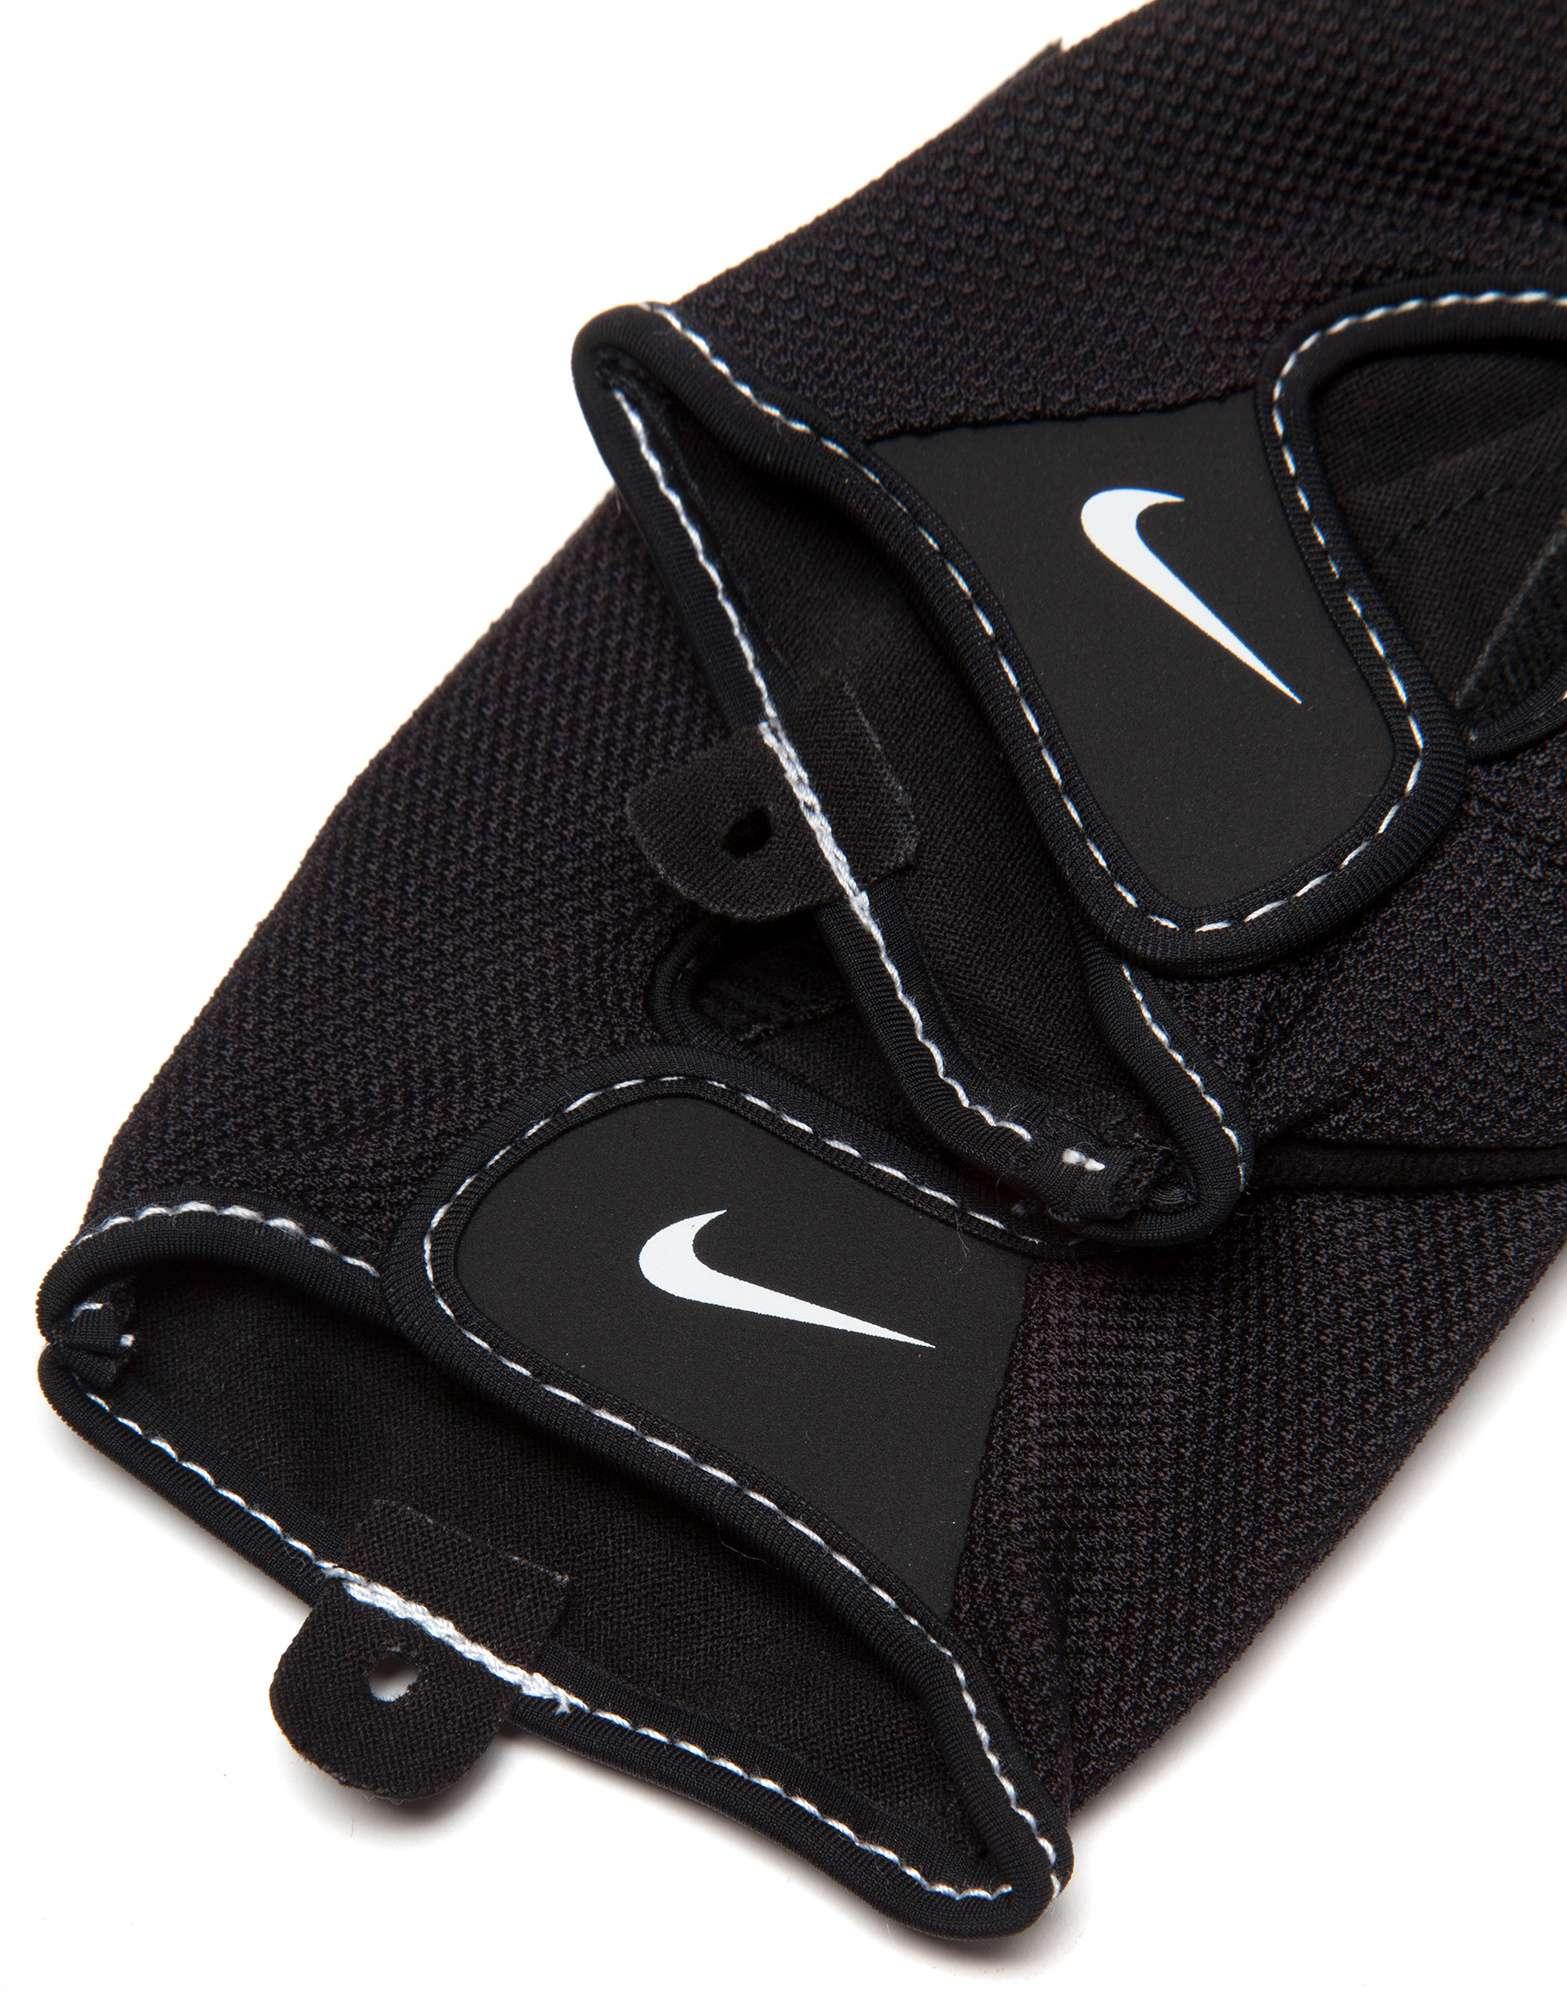 Nike Womens Fundamental Training Gloves